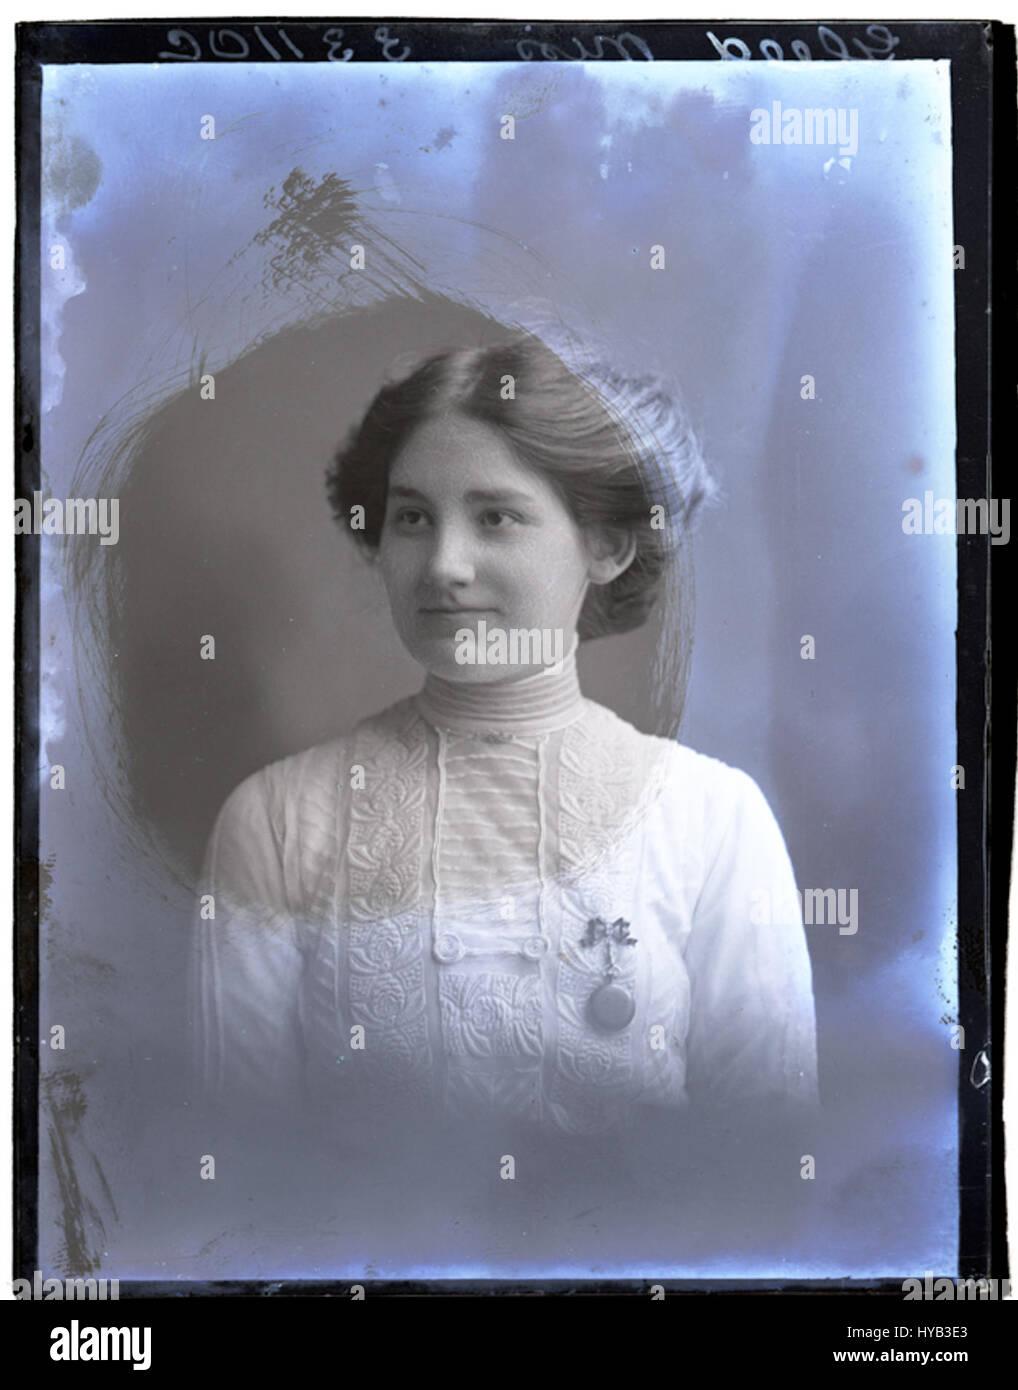 Gleed, 8 Oct 1912 (17375738169) Photo Stock